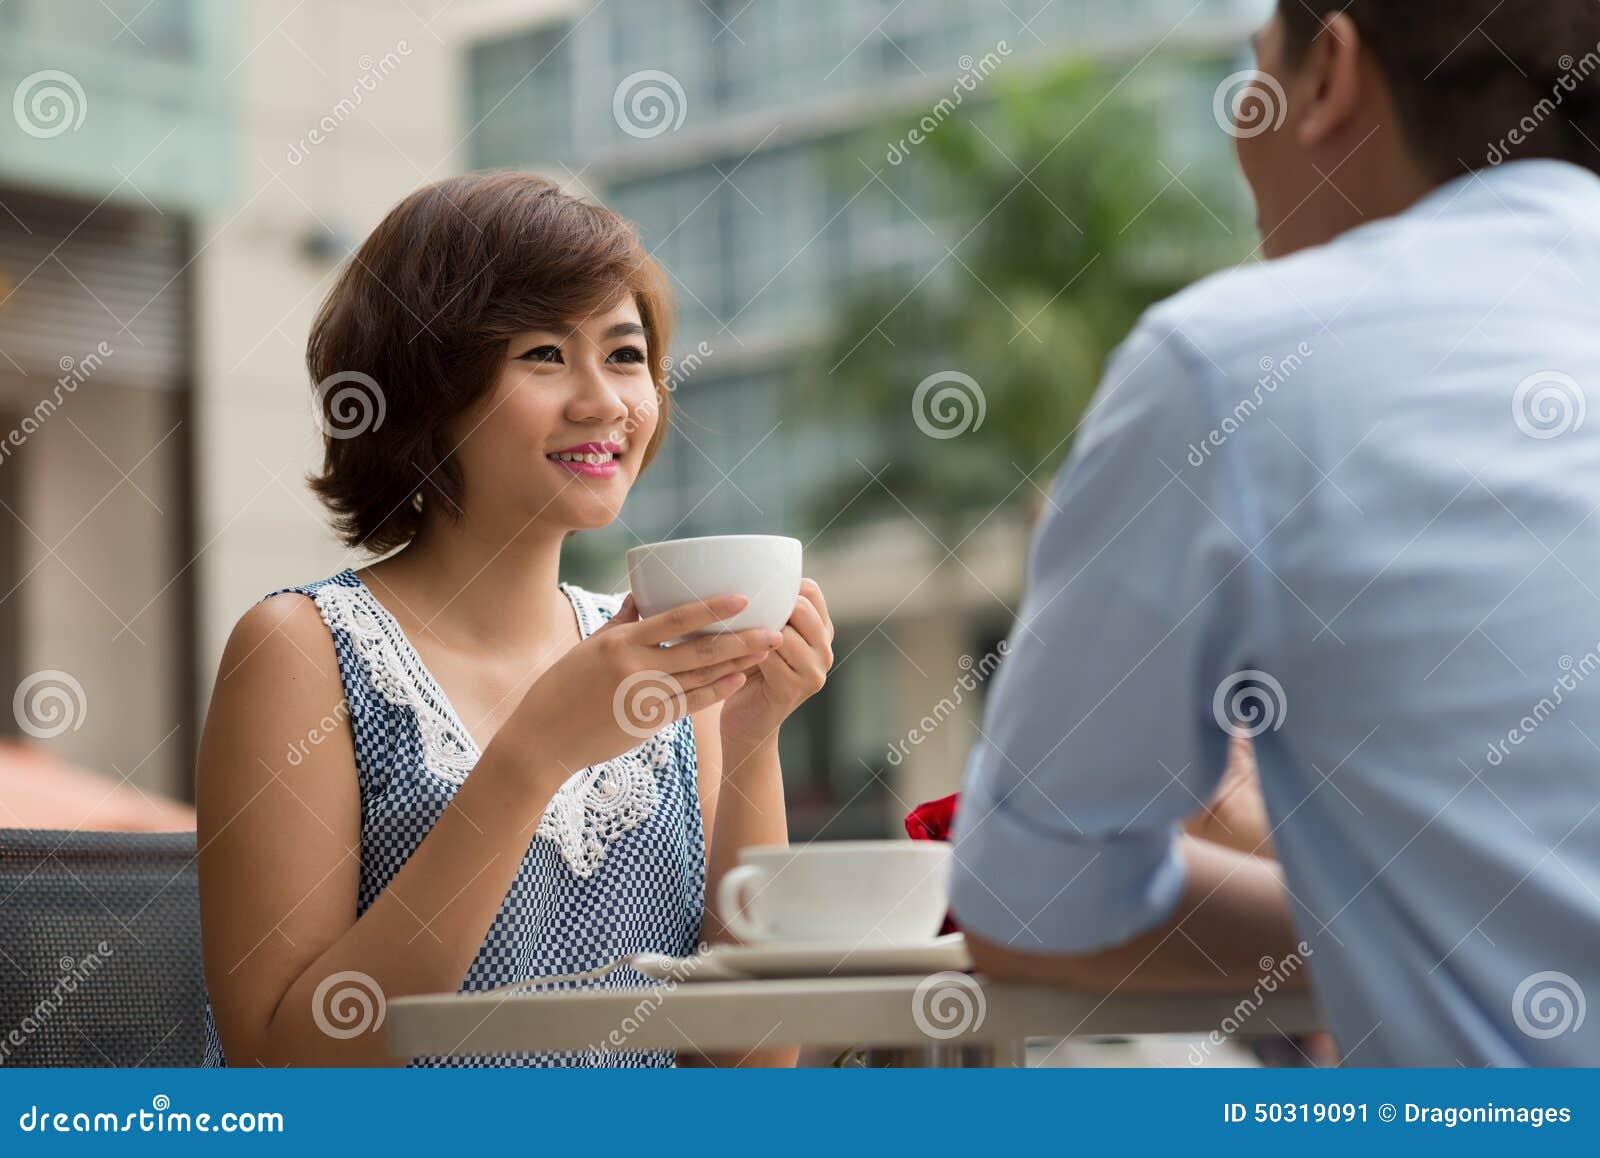 vietnamese dating site free